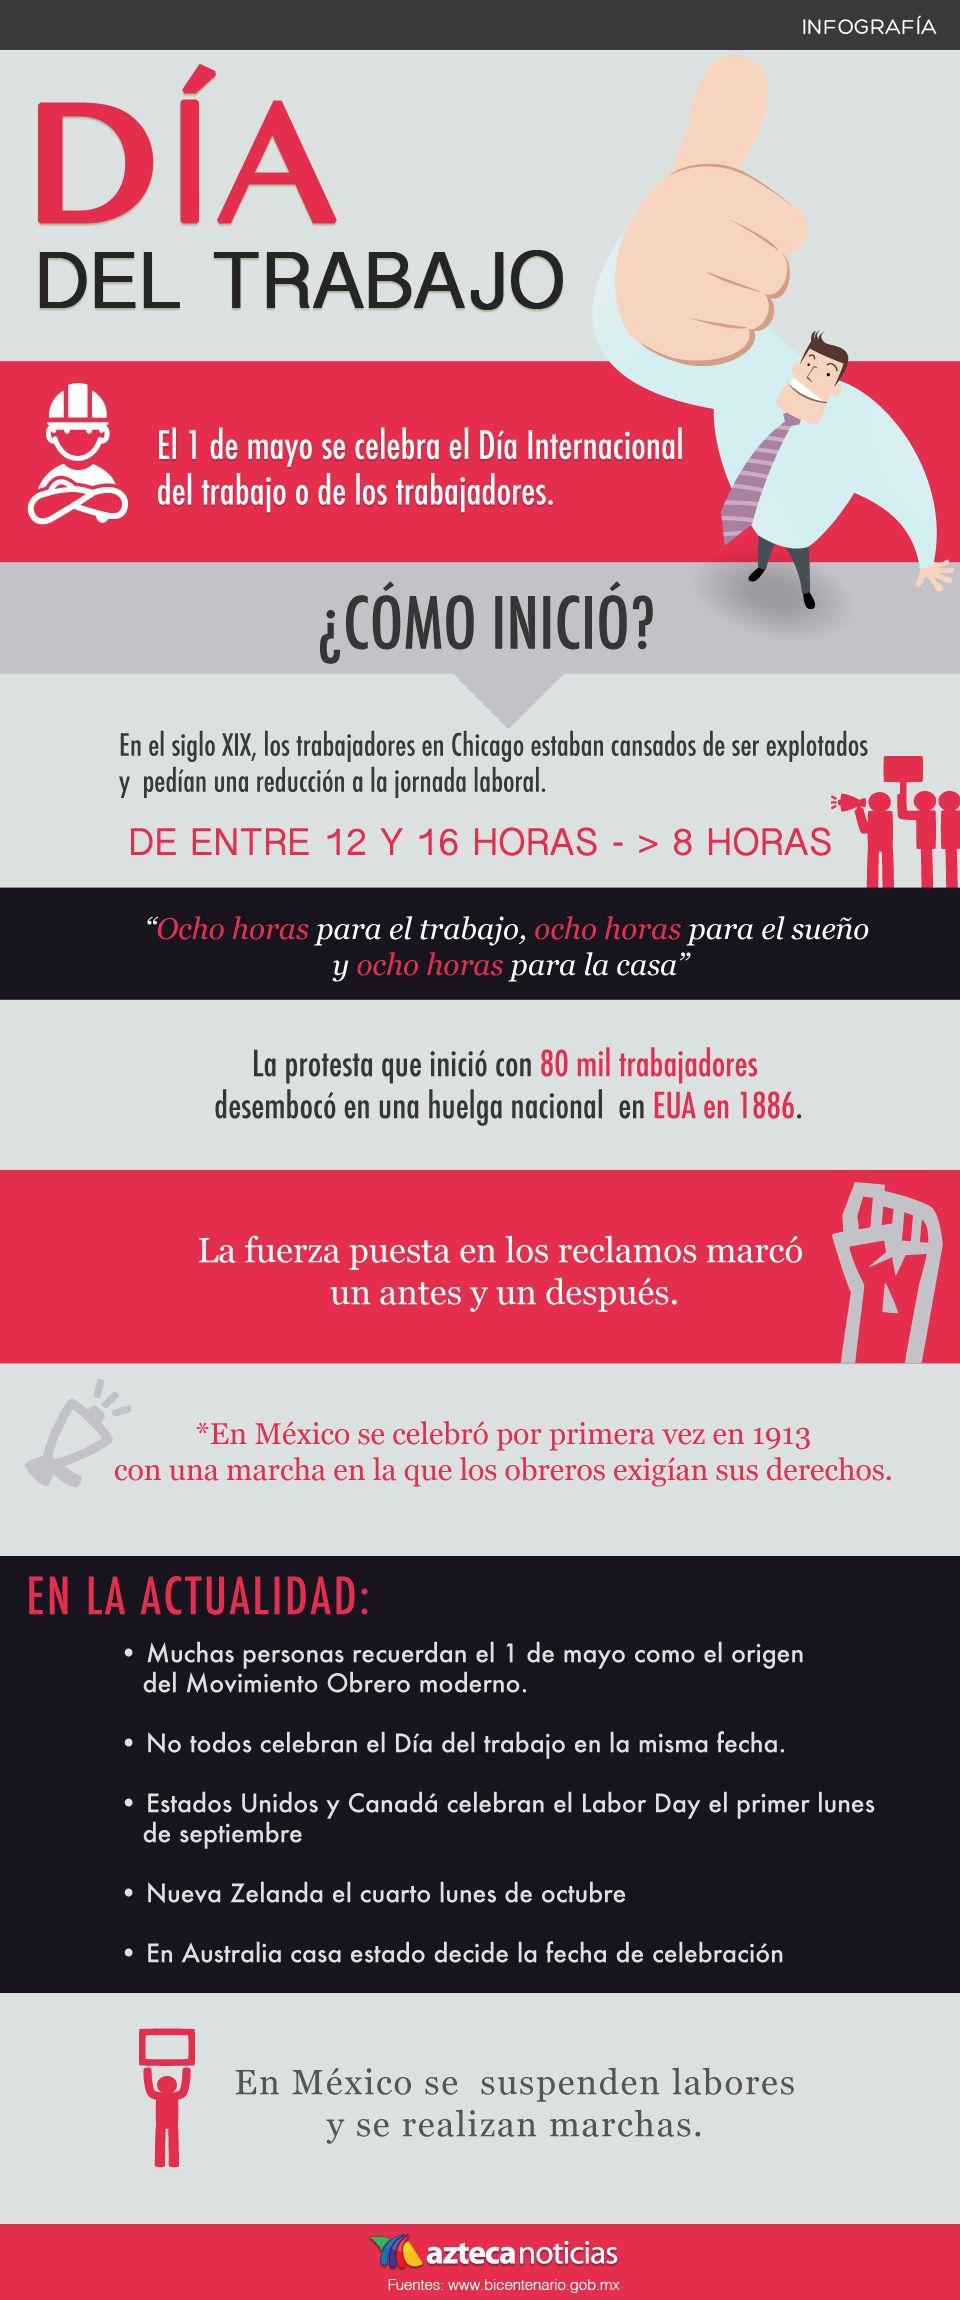 Dia Del Trabajo Infografia Www Aztecanoticias Com Mx Words School Time School